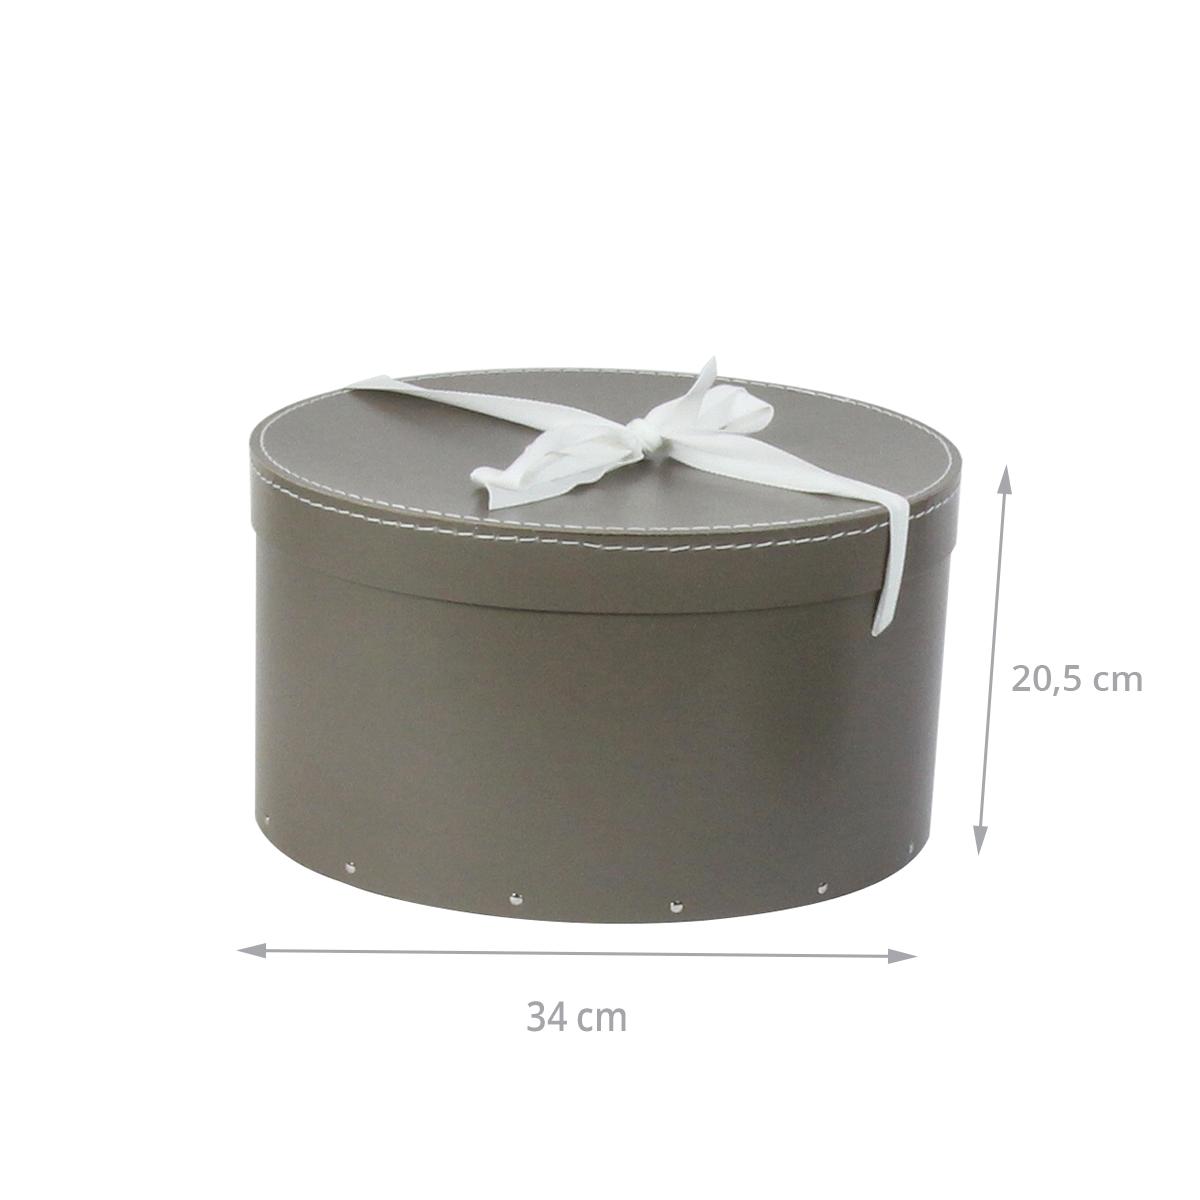 bo te chapeaux taupe avec ruban blanc rangement. Black Bedroom Furniture Sets. Home Design Ideas